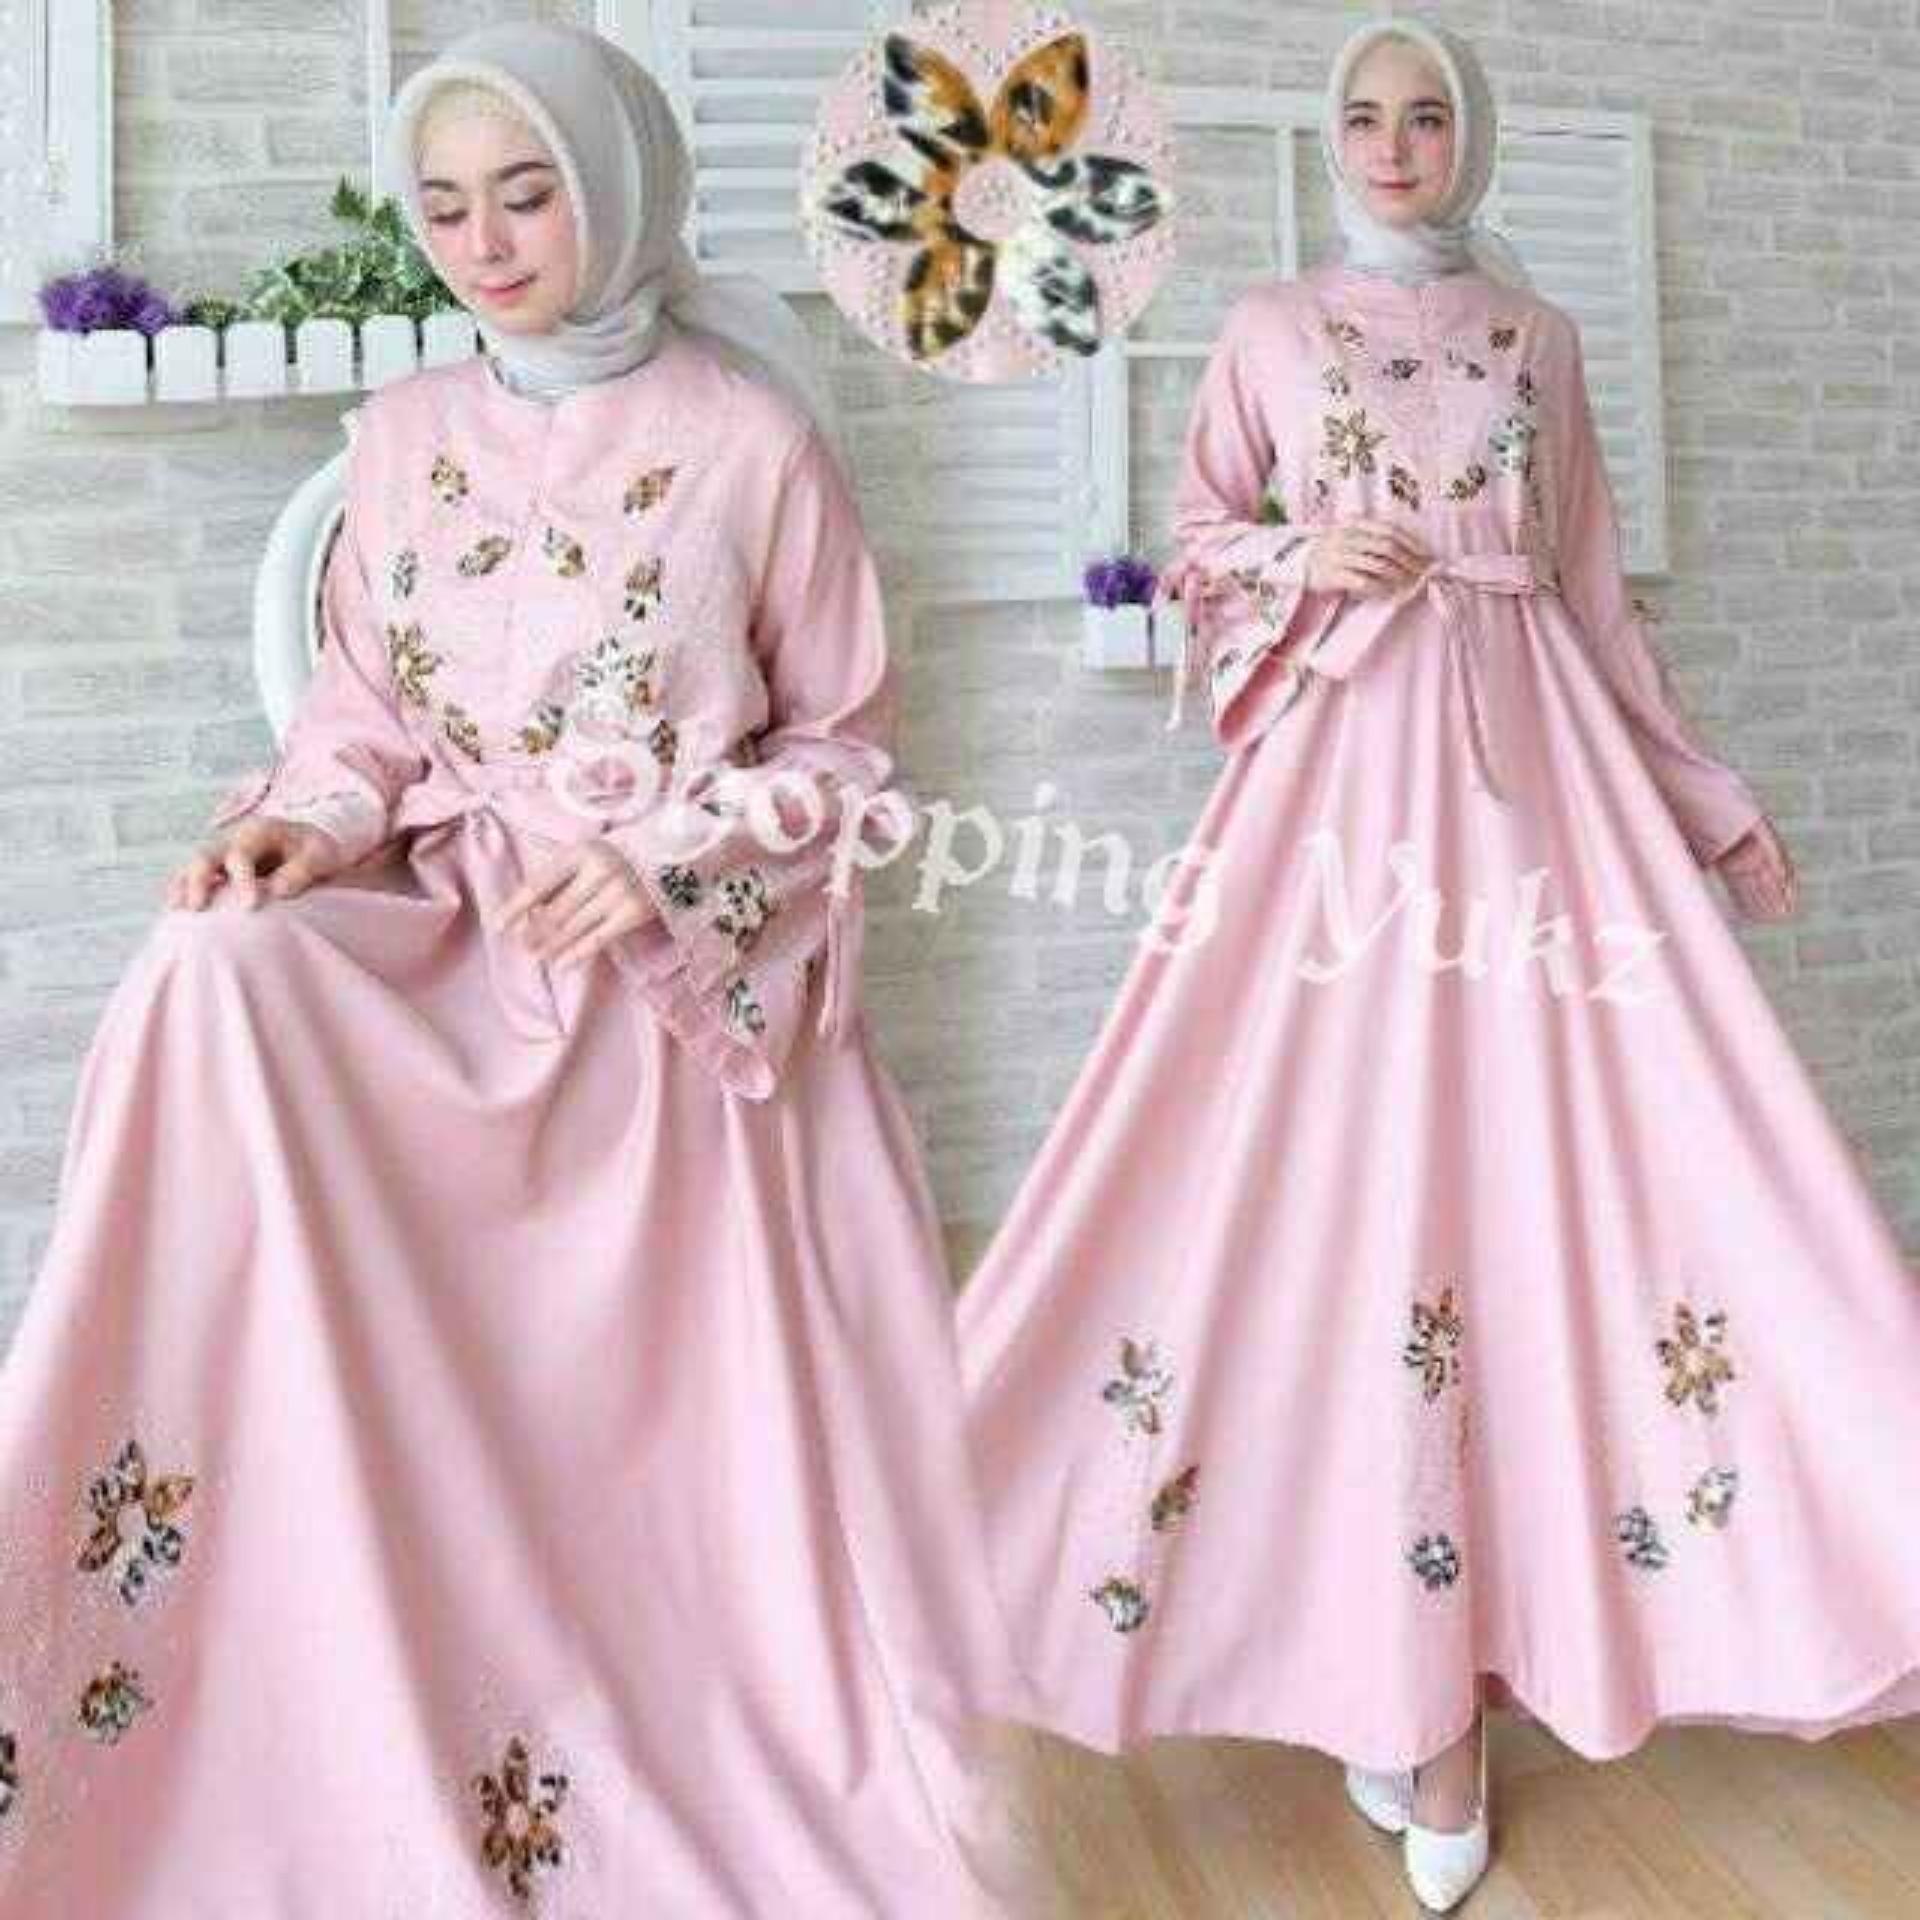 Shopping Yukz Baju Gamis Dress Muslim Syari Wanita MAXI FLOWER ( Tanpa Jilbab ) / Hijab Muslimah / Baju Muslimah Wanita / Syari Syari'i Muslim / Gaun Muslim / Long Dress Muslimah Wanita